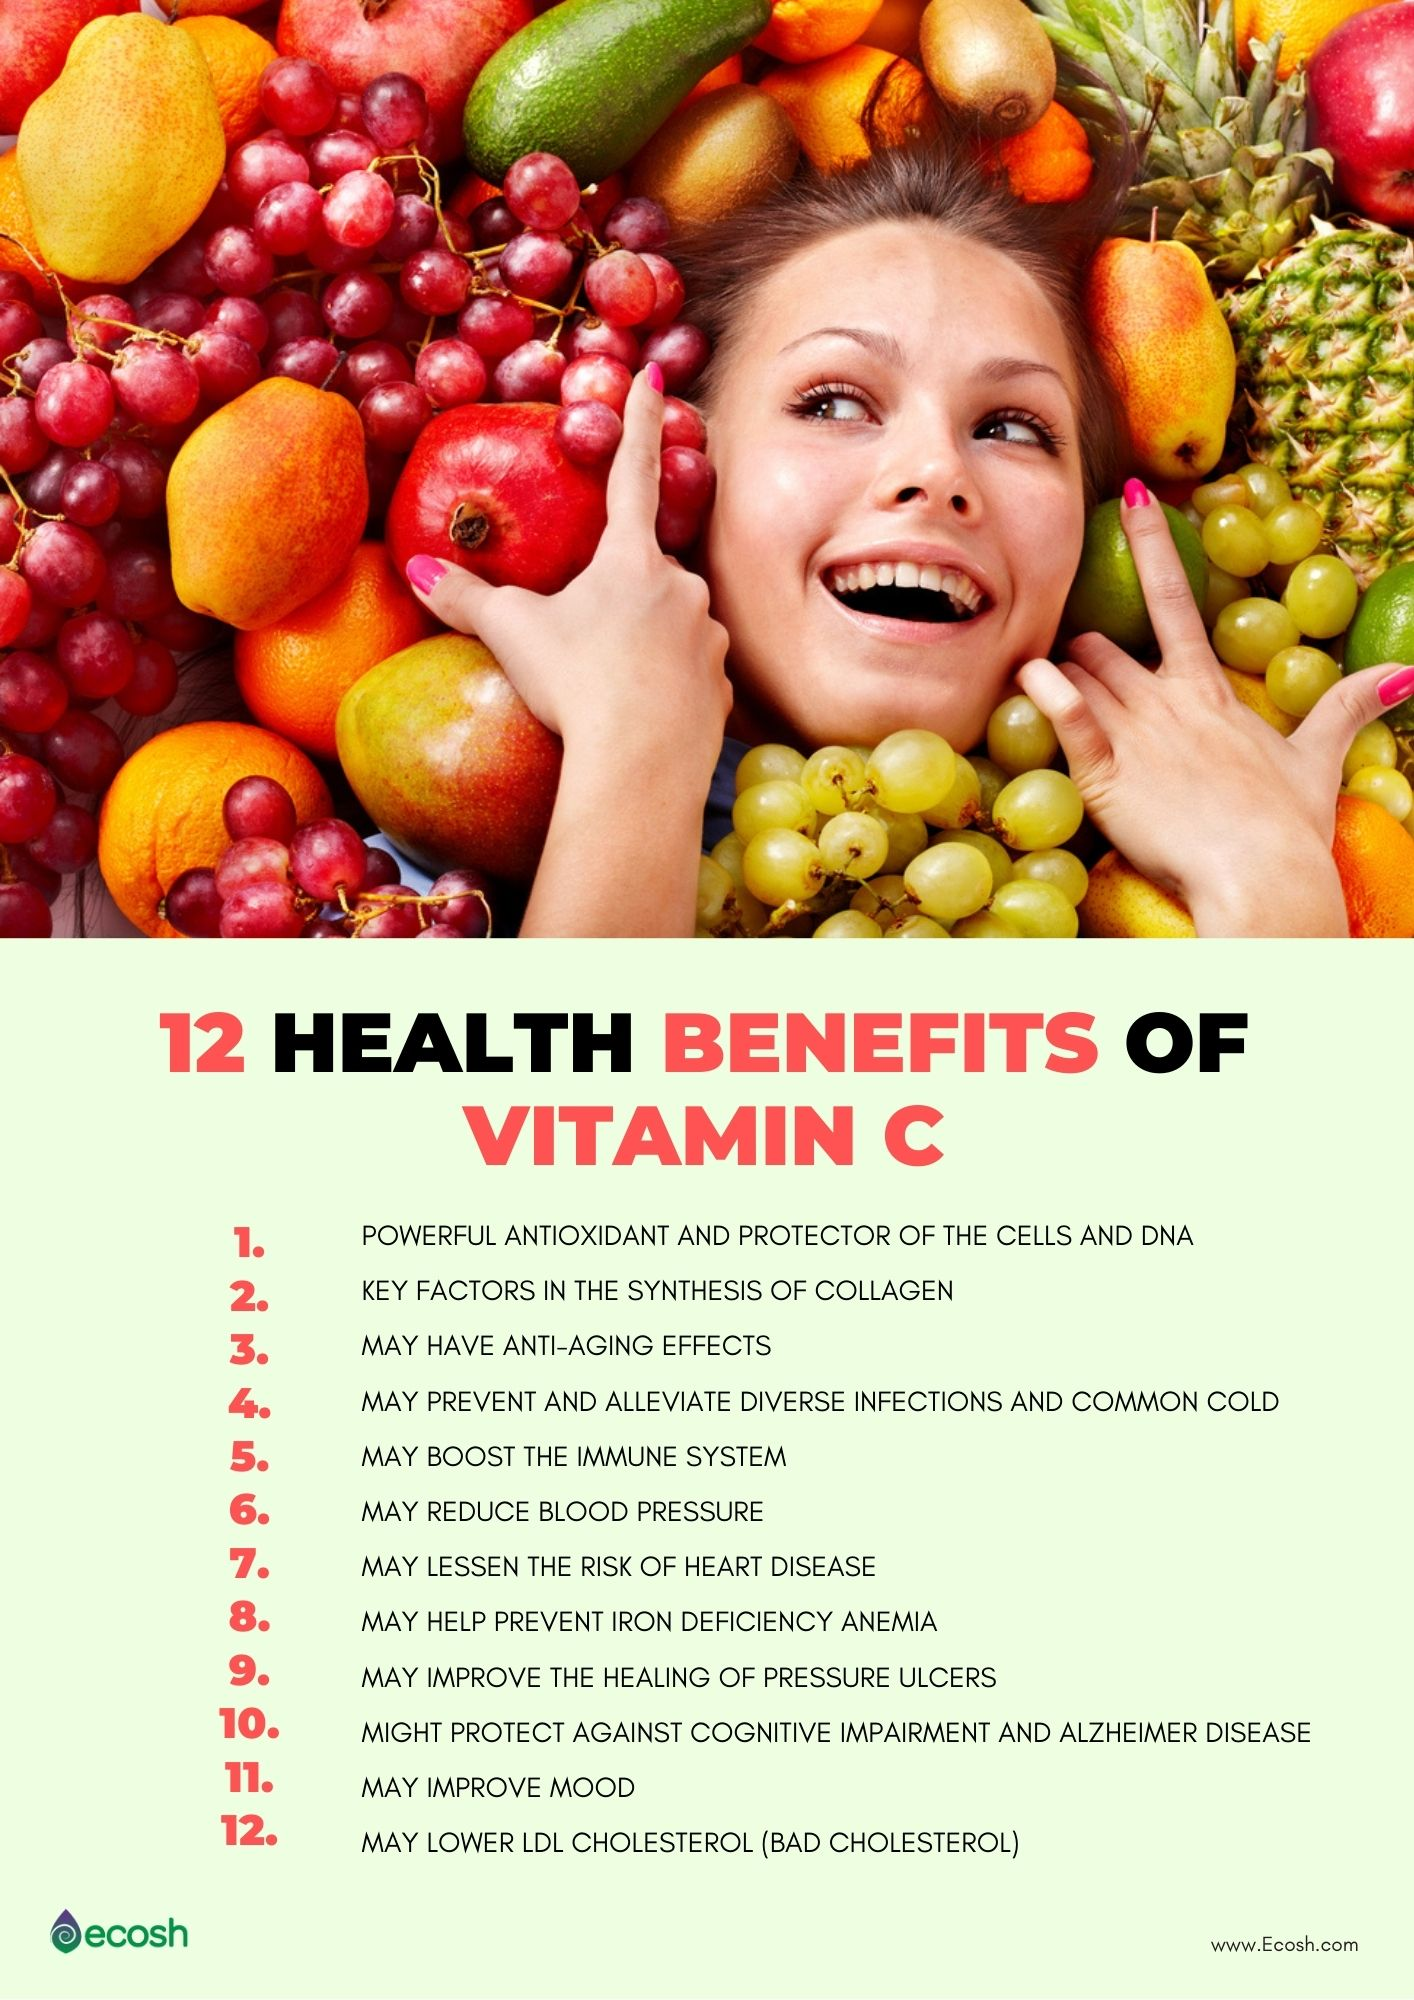 Ecosh_2020_Health_Benefits_of_Vitamin_C_Ascorbic_Acid_Health_Benefits_Vitamin_C_Health_Benefits_Vitamin_C_Supplements_Vitamin_C_Health_Products